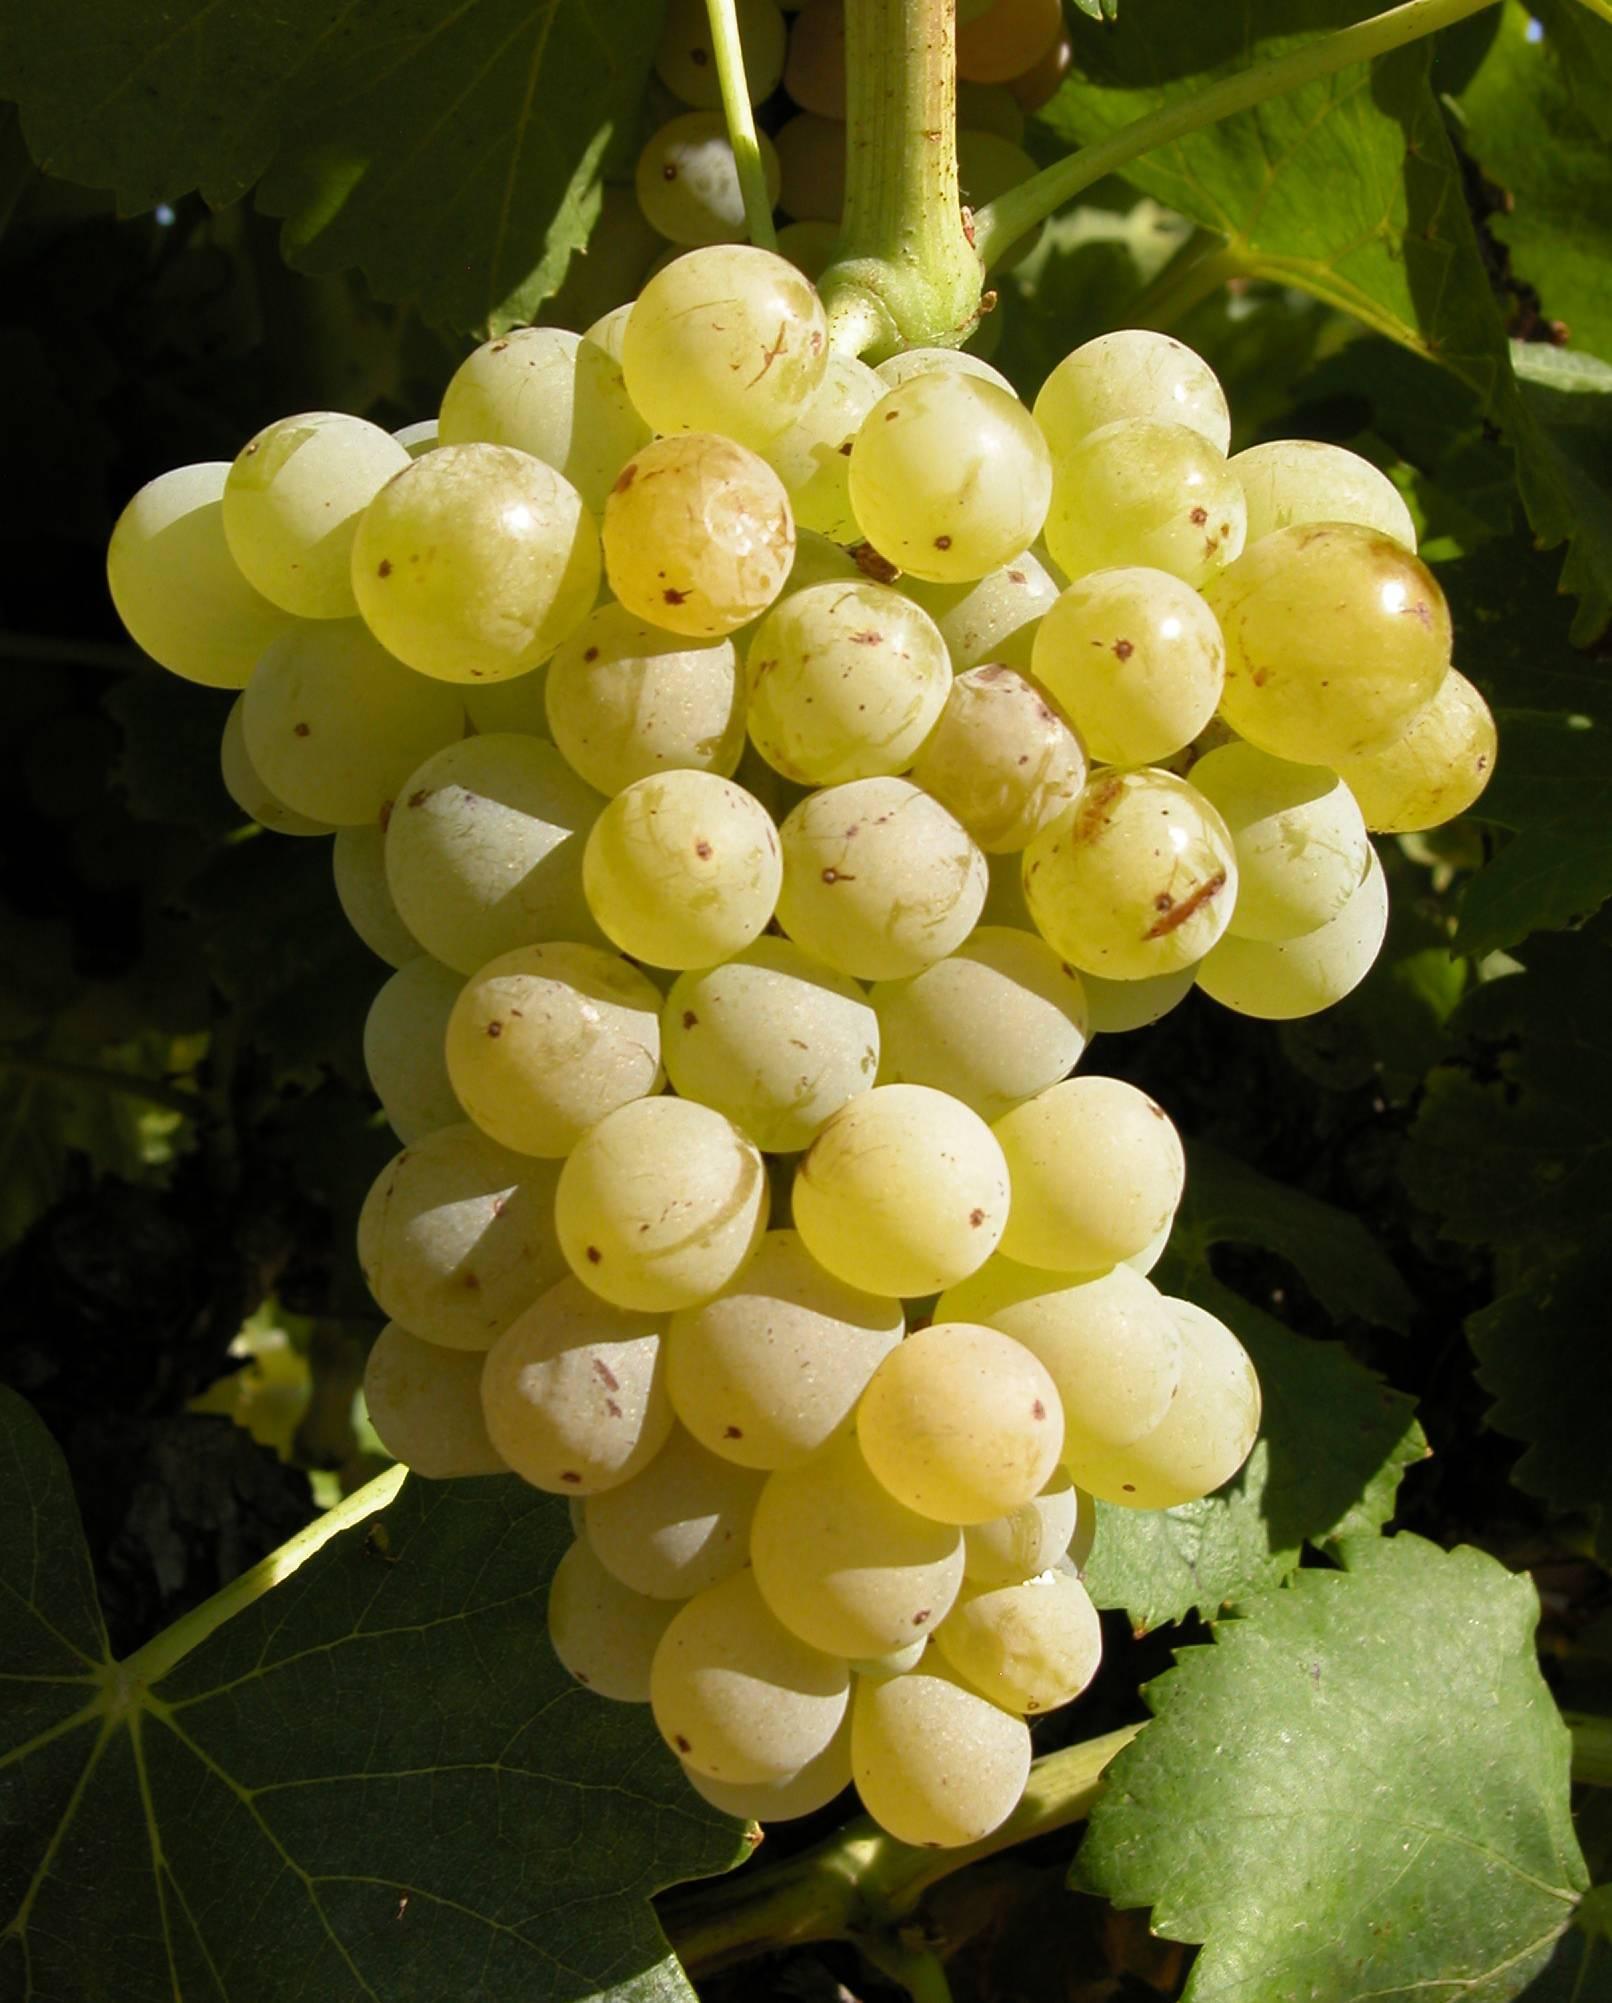 Сорта винограда по алфавиту (от а до я) с фото и описанием